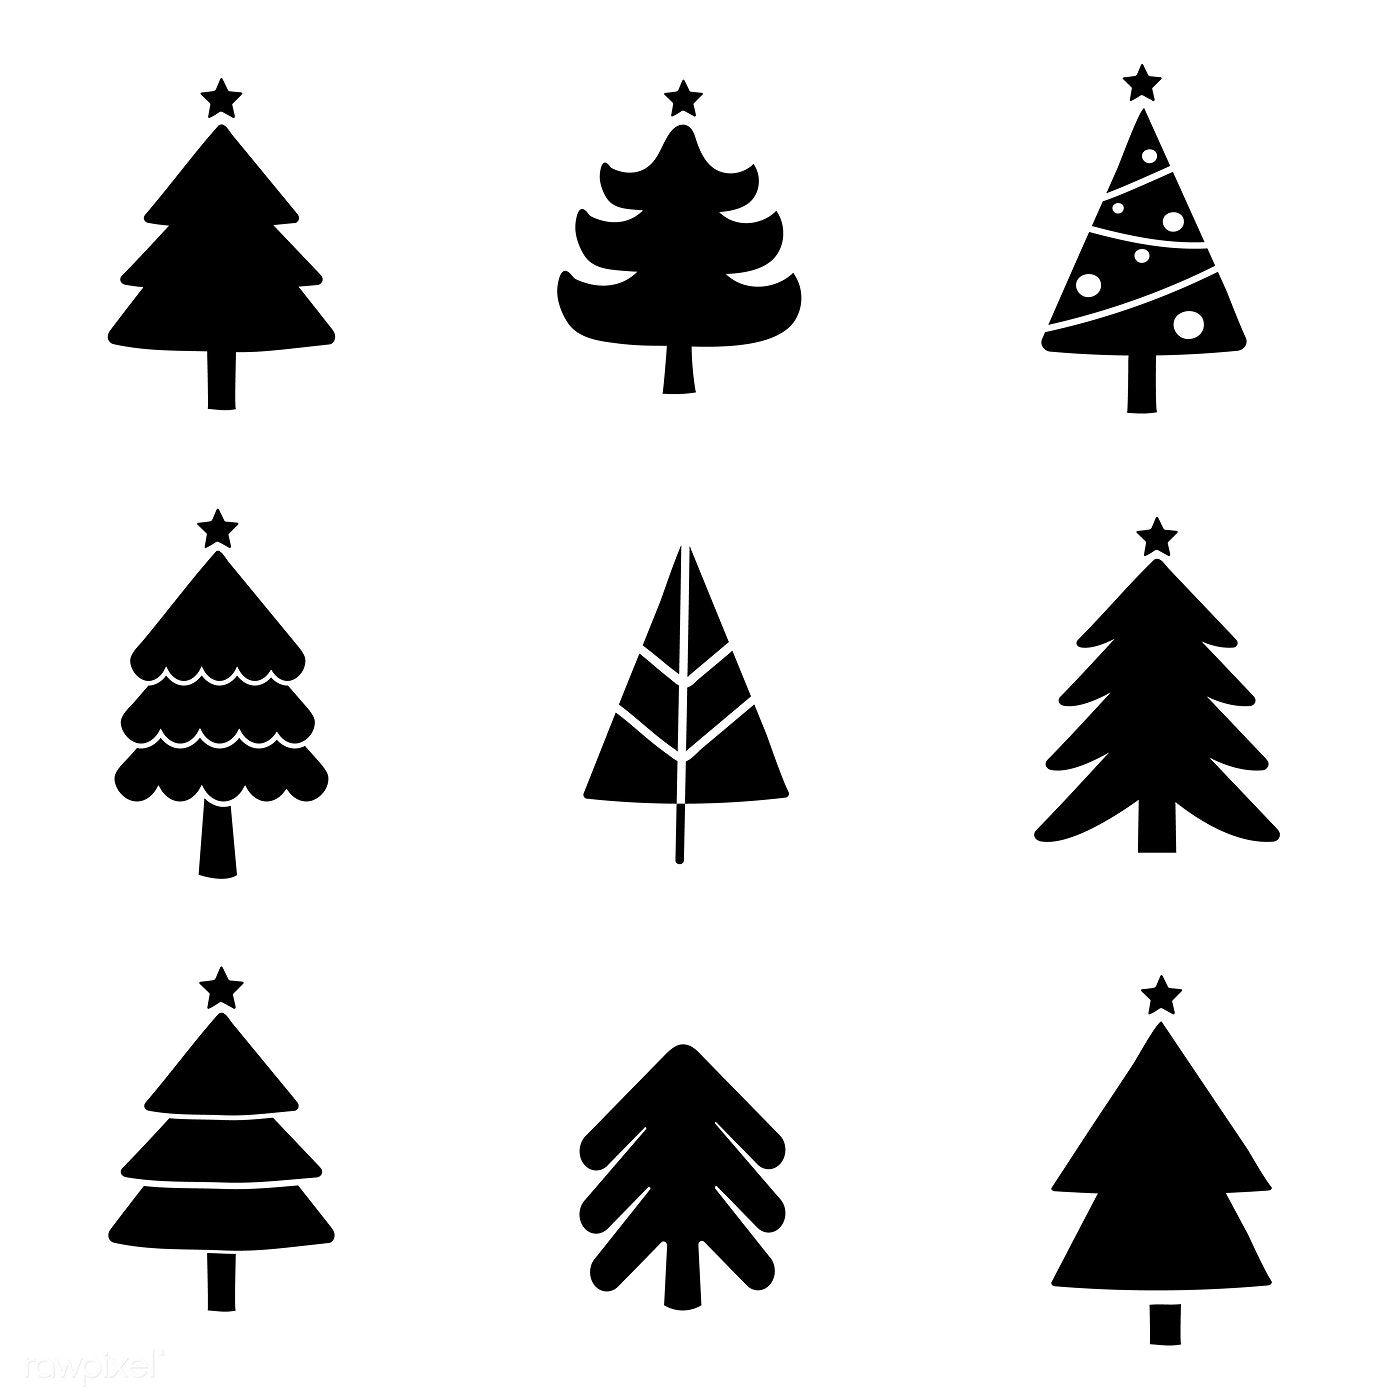 Set Of Christmas Tree Design Elements Vector Free Image By Rawpixel Com Christmas Tree Design Tree Designs Christmas Design